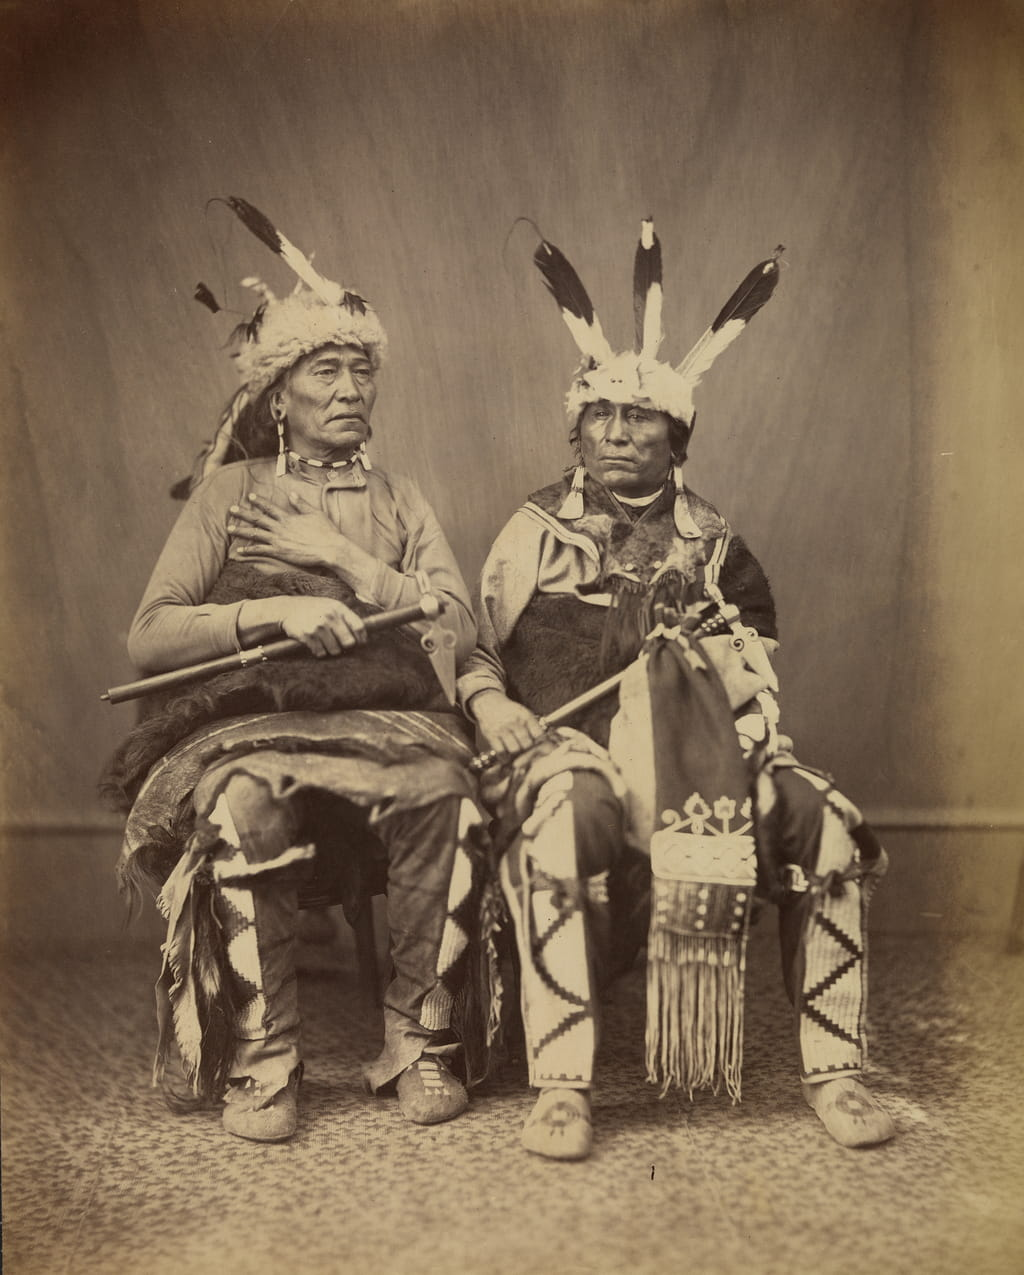 Ihanktonwan Nakota delegates Si-ha-han-ska (Long Foot), left and Wa-jin-ka (Little Bird), right by Alexander Gardner, 1867. (National Museum of the American Indian Archive Center, Smithsonian Institution)